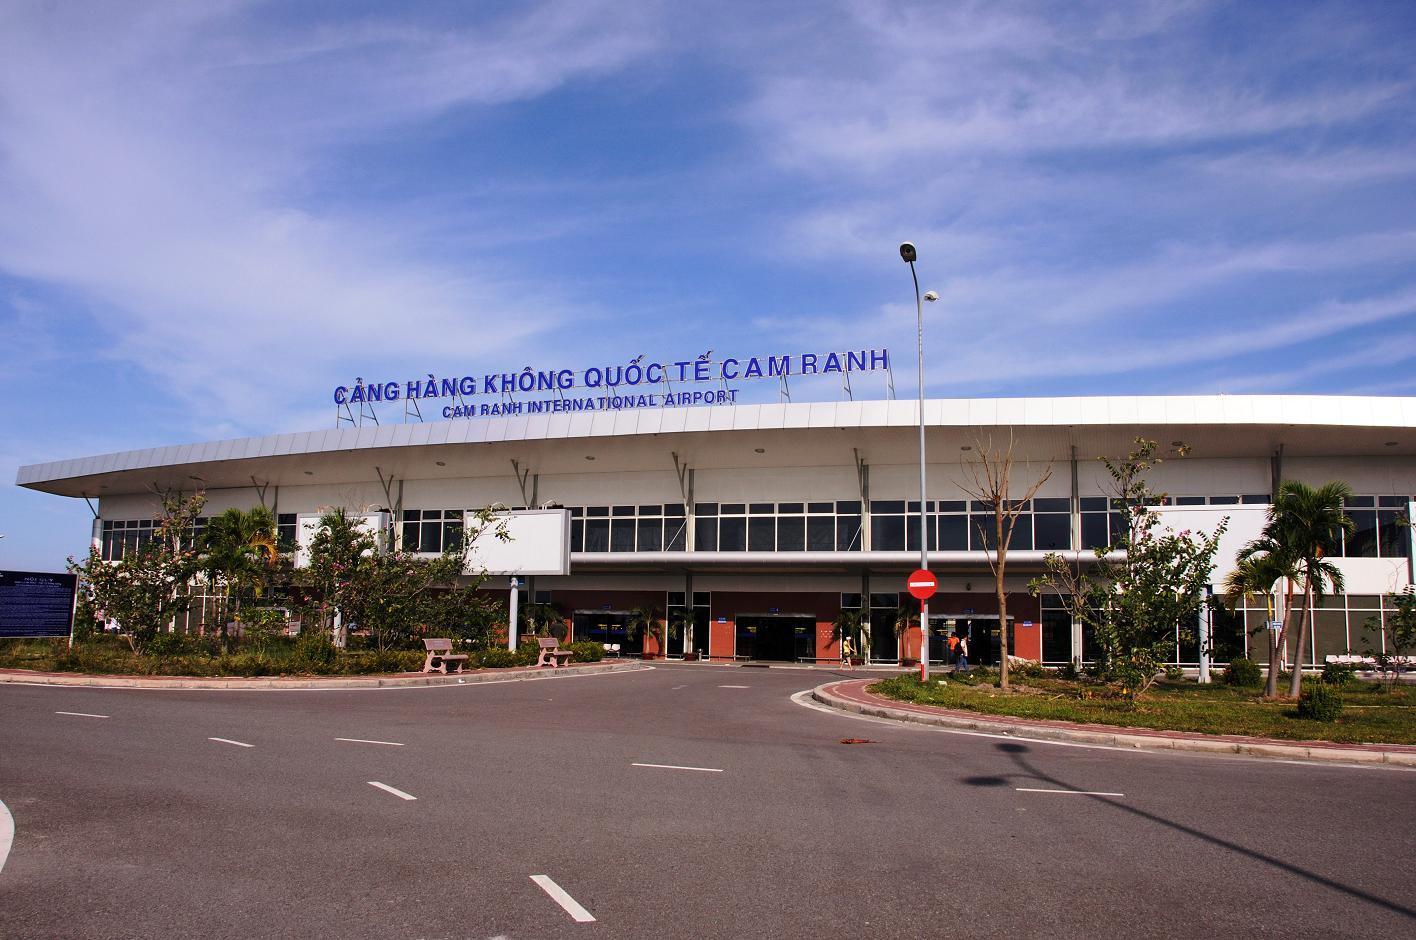 Vietnam Airport – Cam Ranh